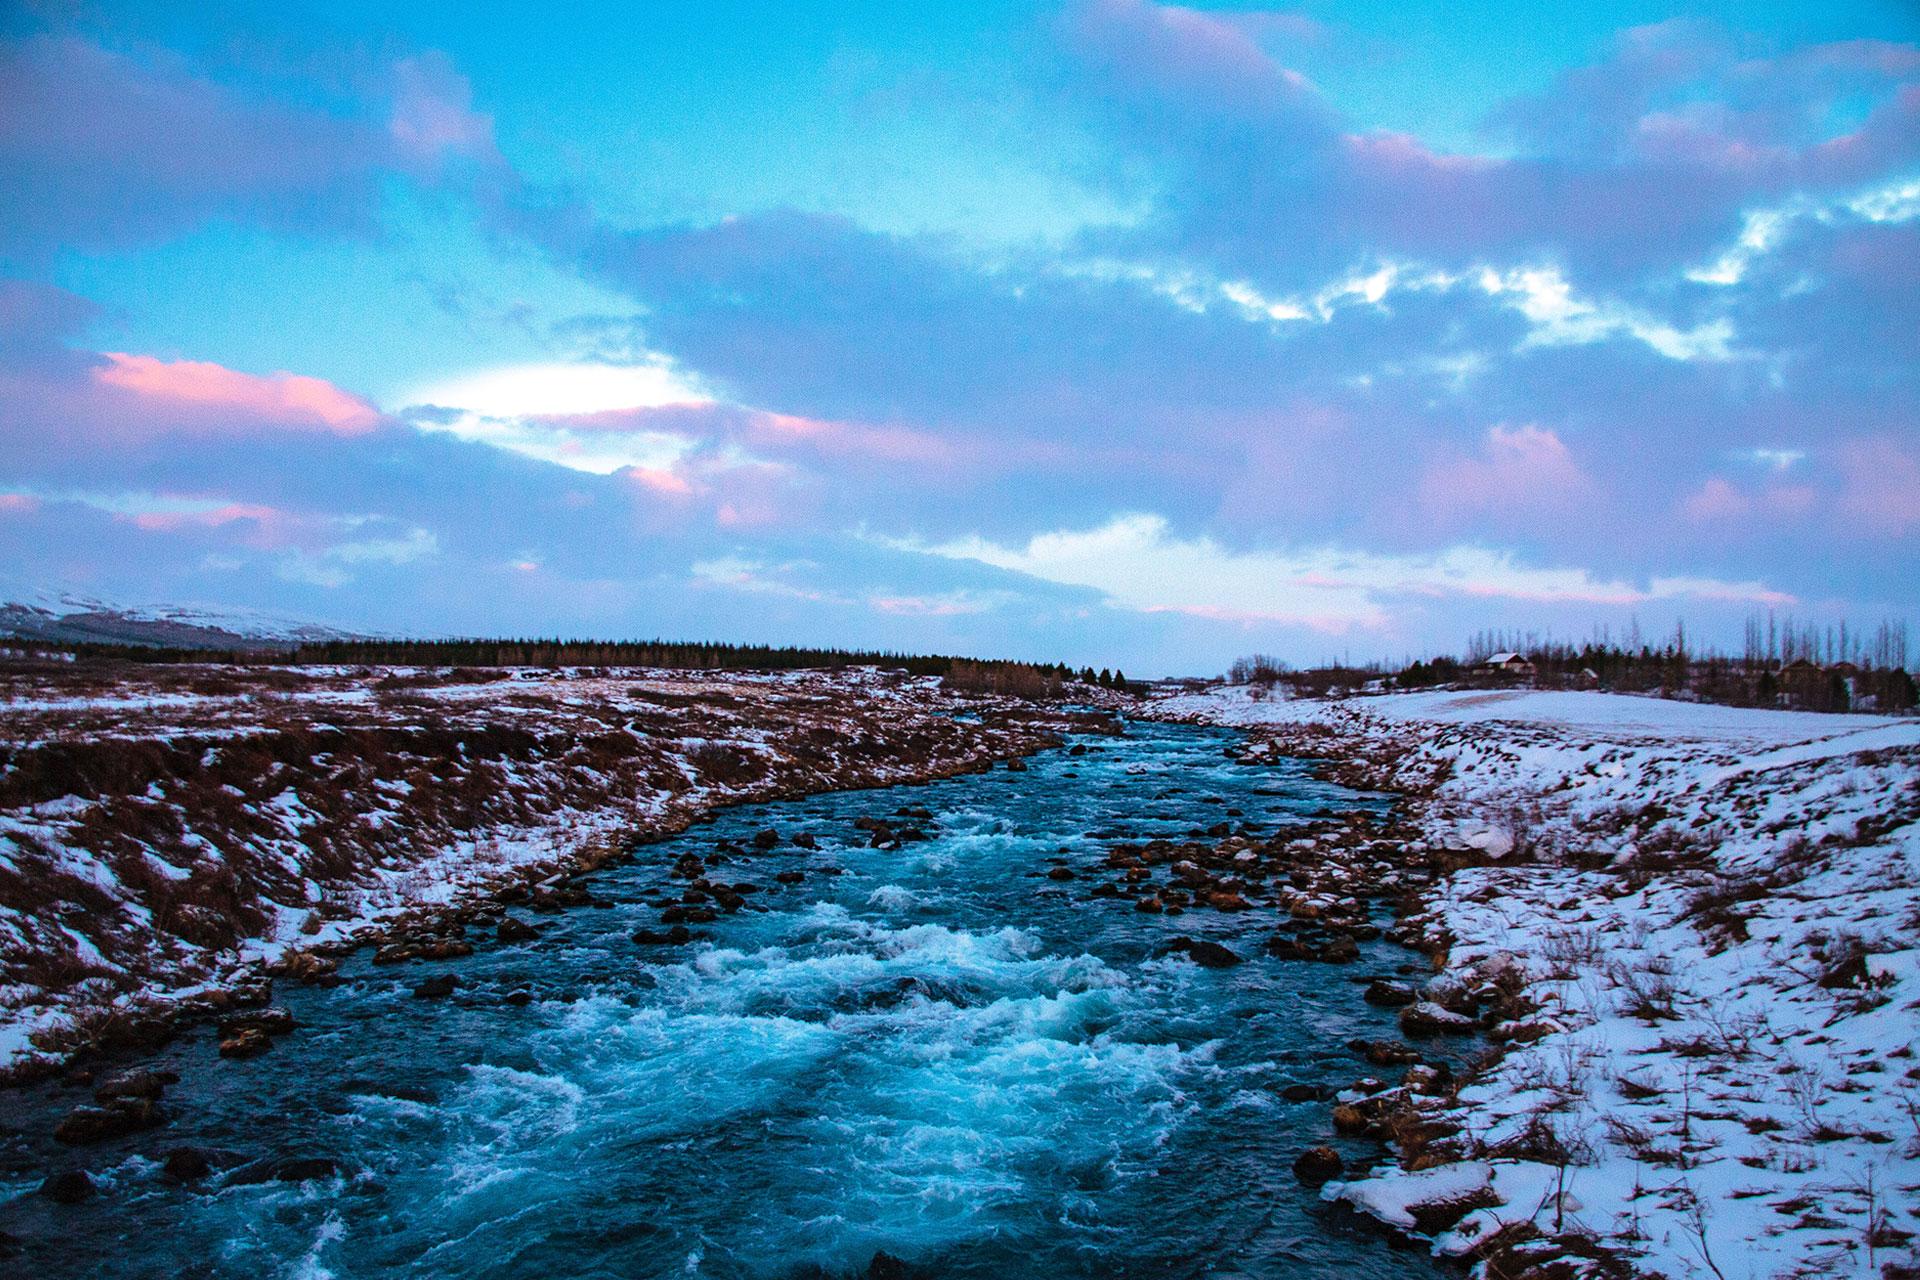 Lodowata woda lodowcowa - fot. Kopaniszyn